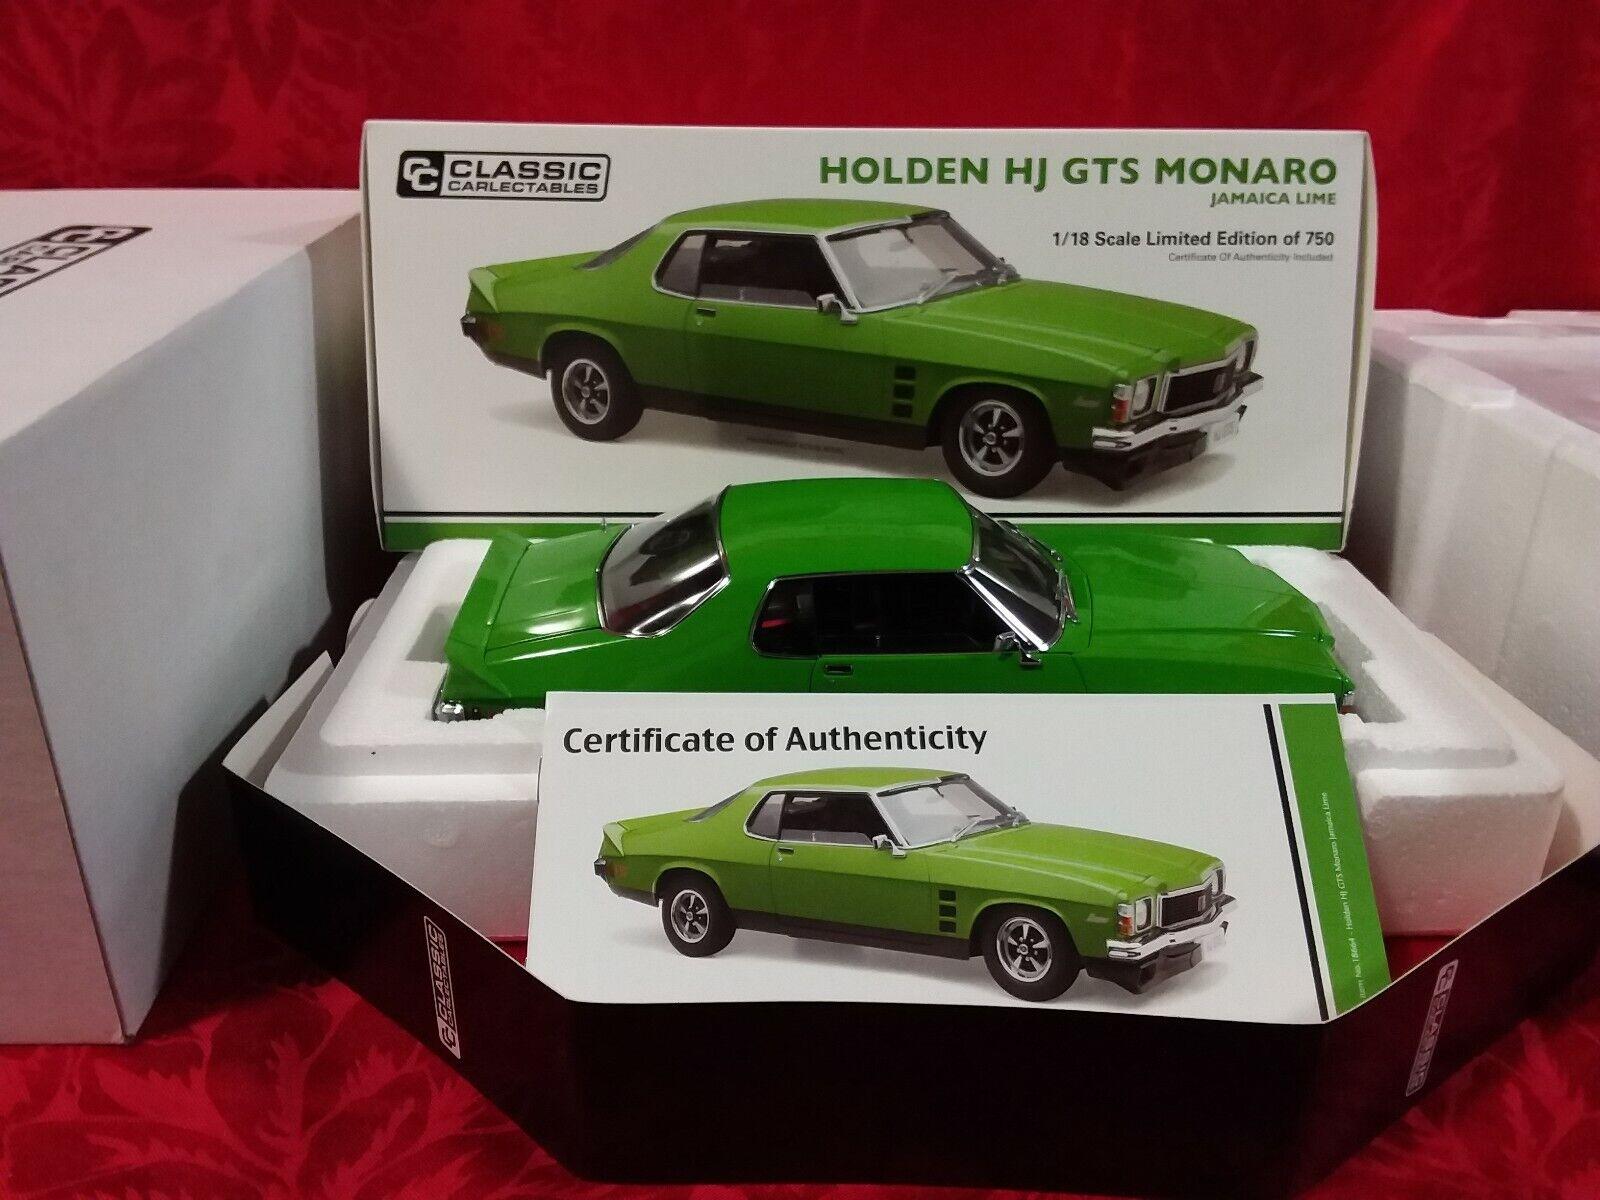 marca Classic Cochelectible 1 18 Holden Holden Holden hj Monaro jamaca Cal 18664  Envíos y devoluciones gratis.